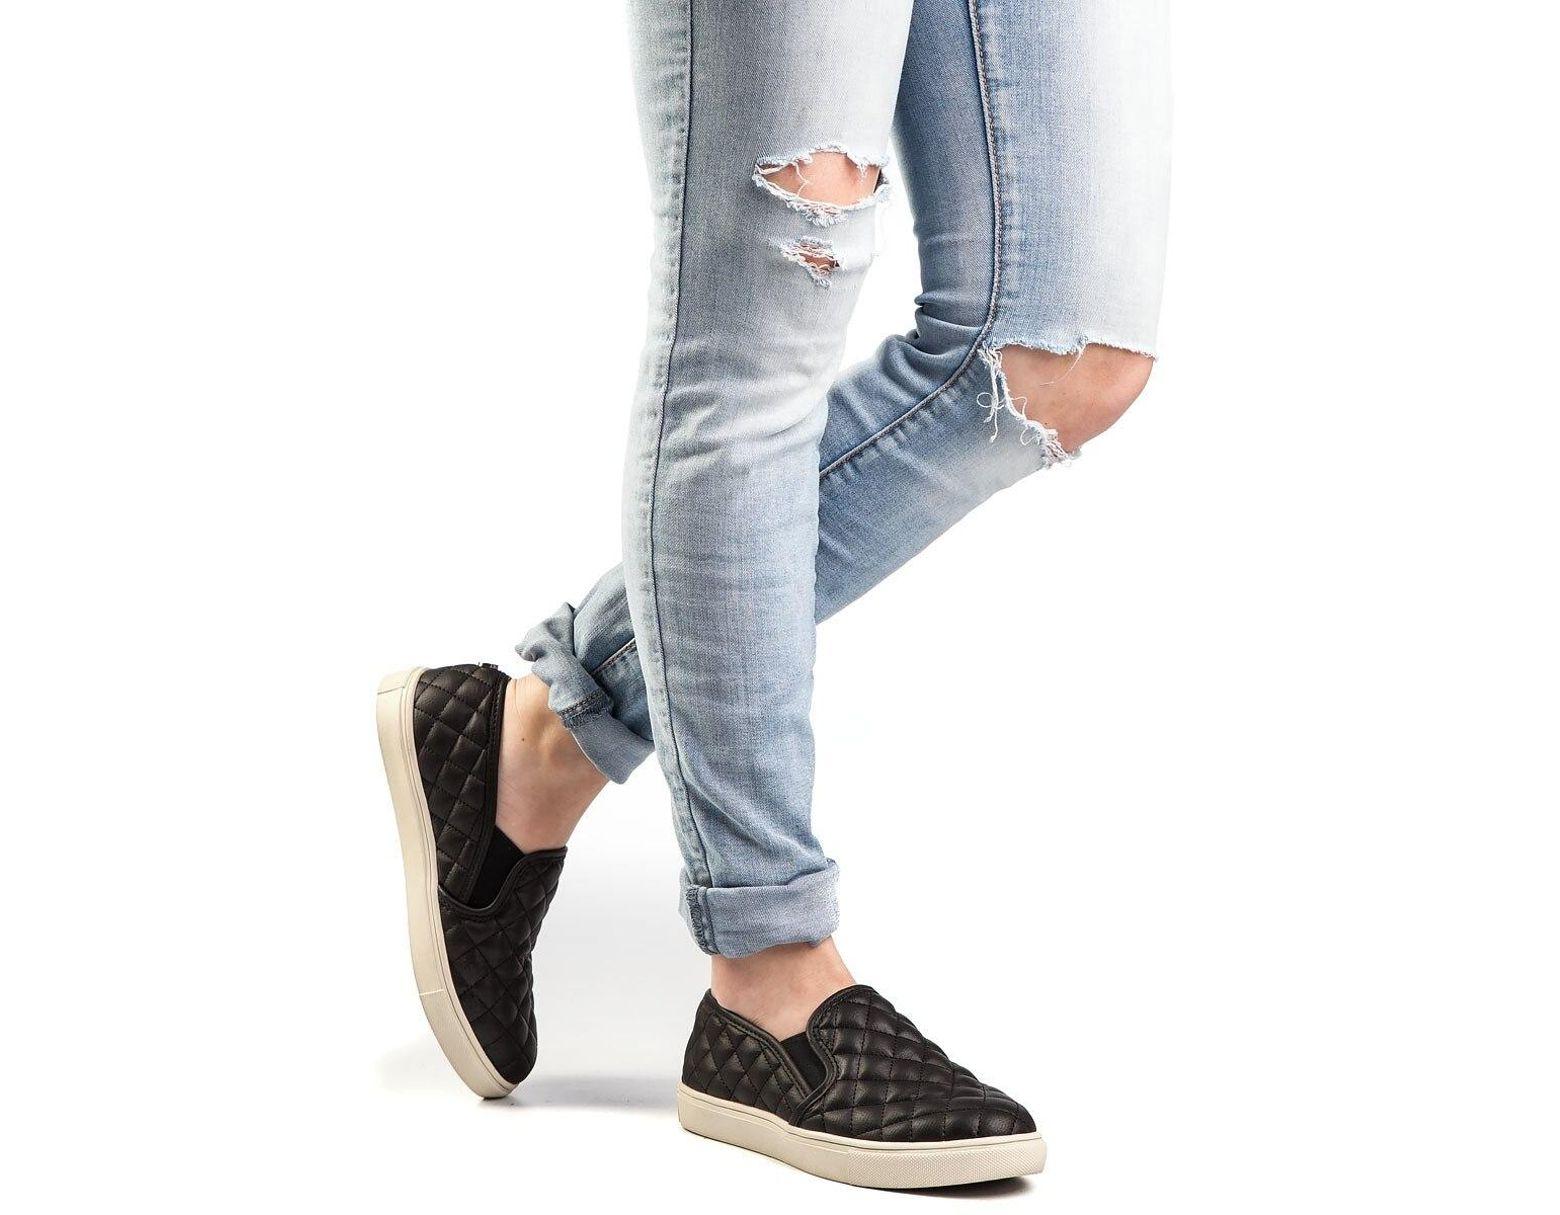 8dc87034a Steve Madden Ecentrcq Slip-on Sneaker Black in Black - Lyst